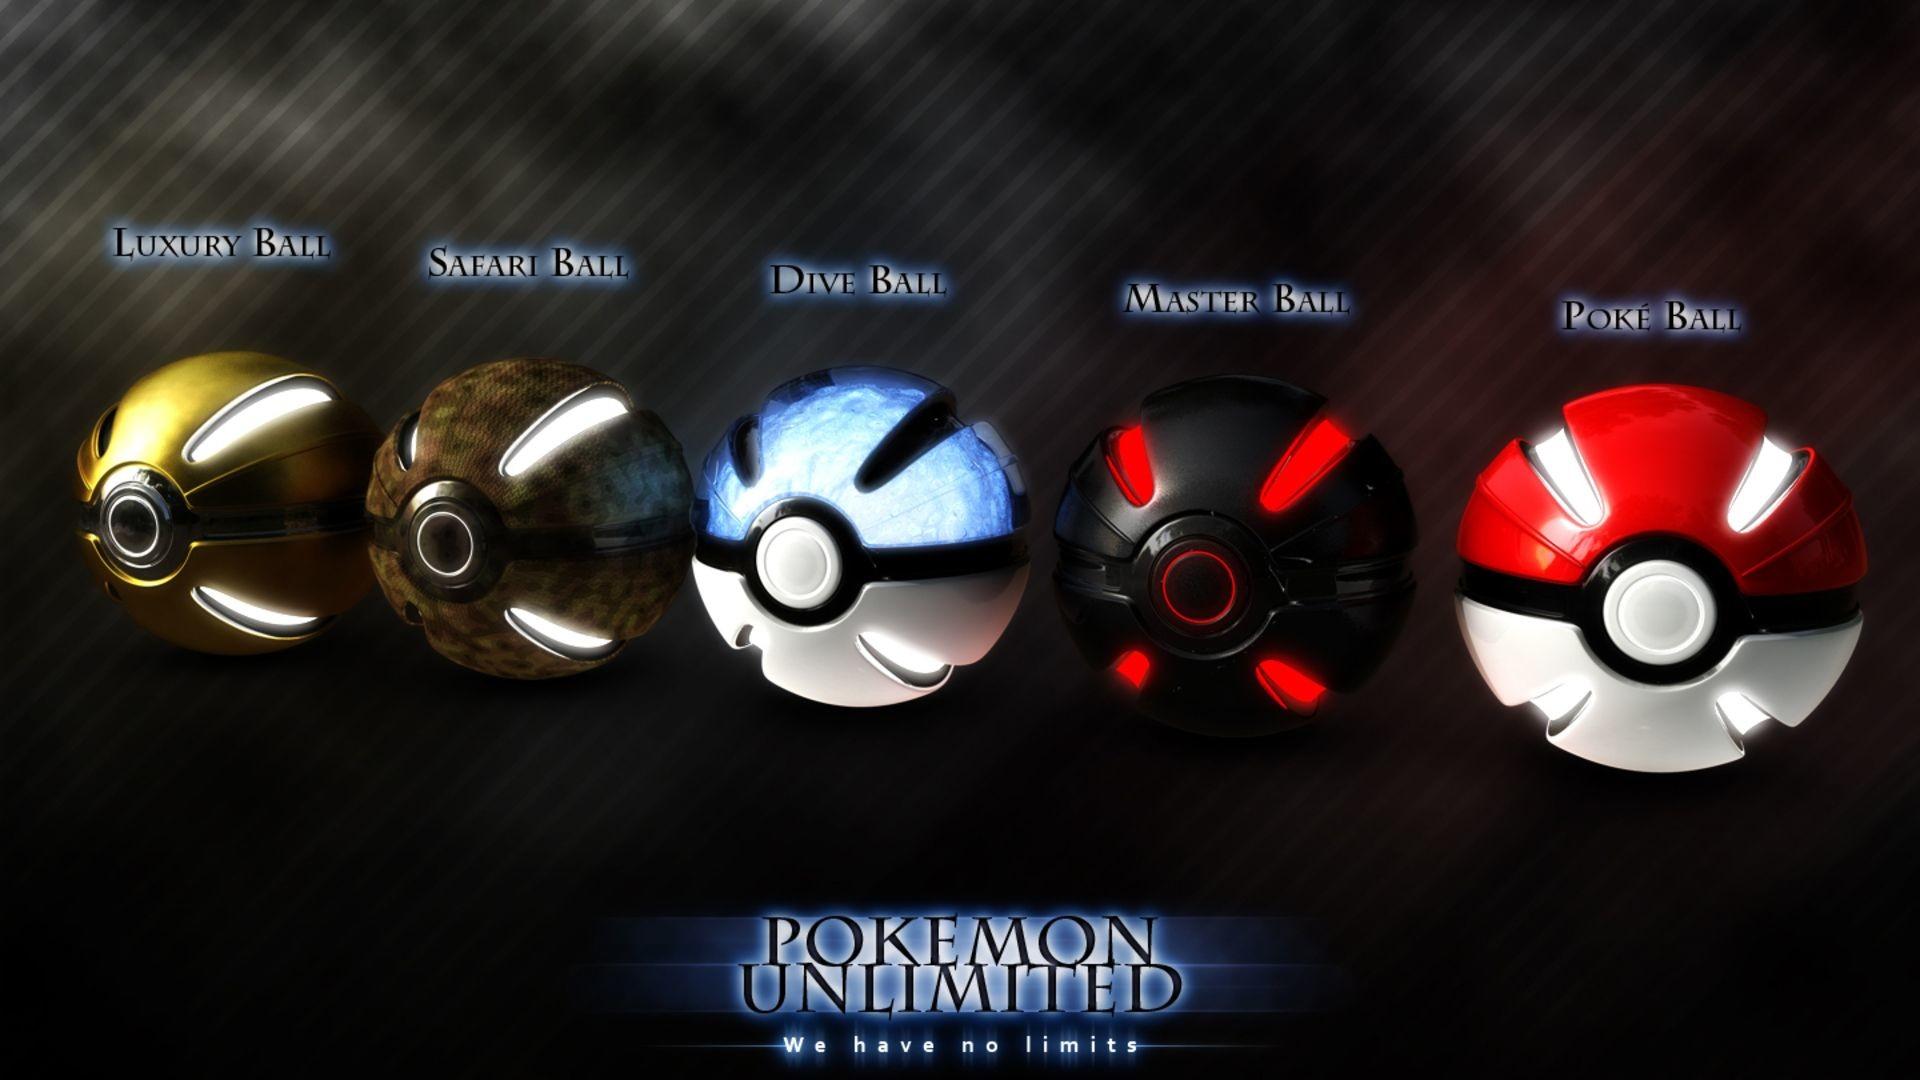 Best Pokemon Wallpapers Ever